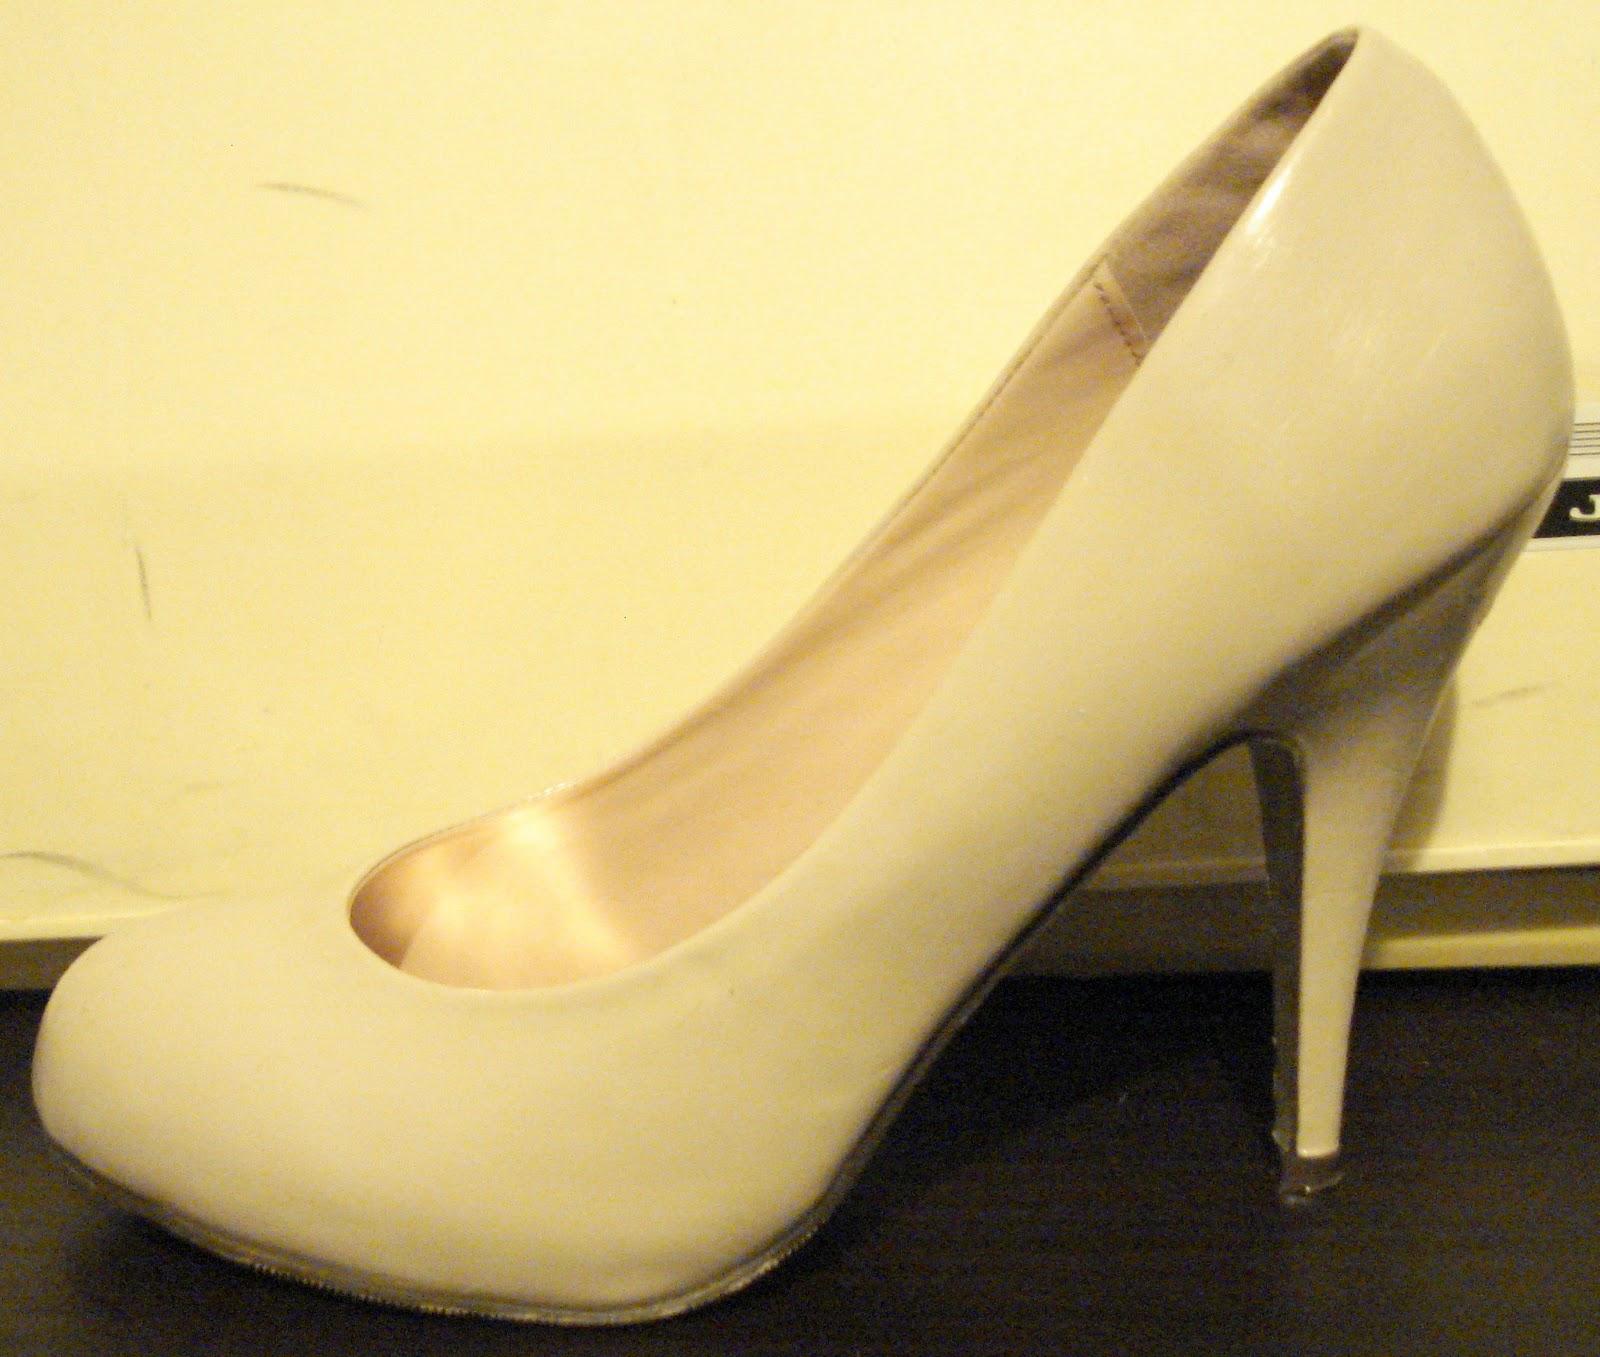 http://4.bp.blogspot.com/-Pc853kK98I0/Tn1PlxOX5gI/AAAAAAAAAko/yZw5eC9wWLo/s1600/Paper+Mache+Shoes+%25282%2529.JPG